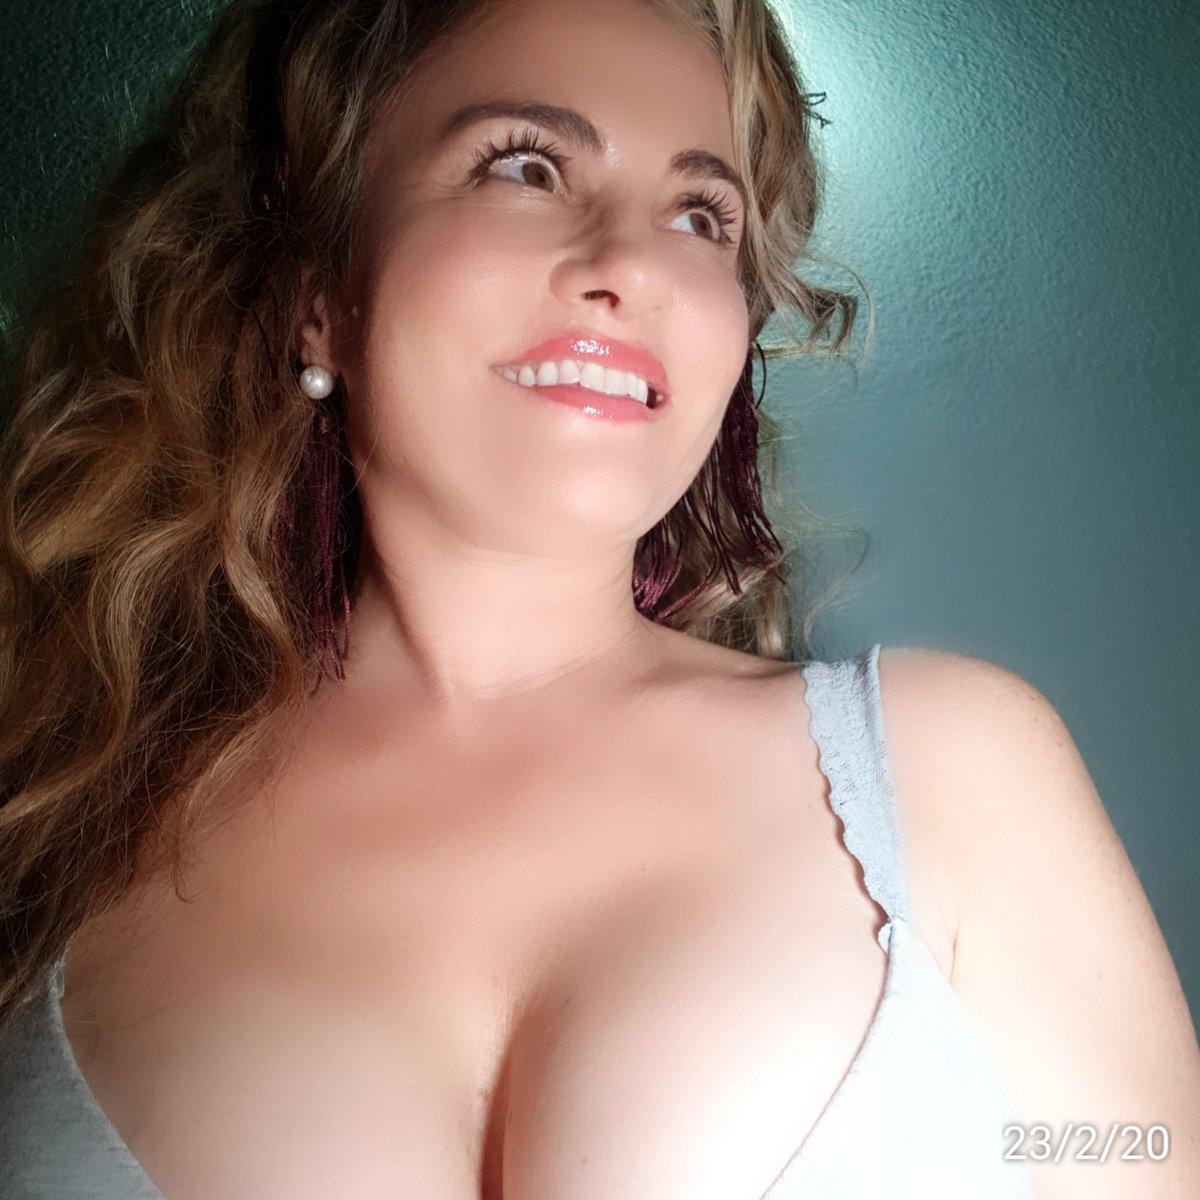 A gift for you...#MotivationMonday #24Febrero #Feliz #auracristinageithner#beautiful #lapotradelabanda #Colombia #happy #vscocam #girl #instagramers #iger #love #loveyouall #actresslife #model #loveislove #smile #follow #2020pic.twitter.com/XxOo3w7Axz